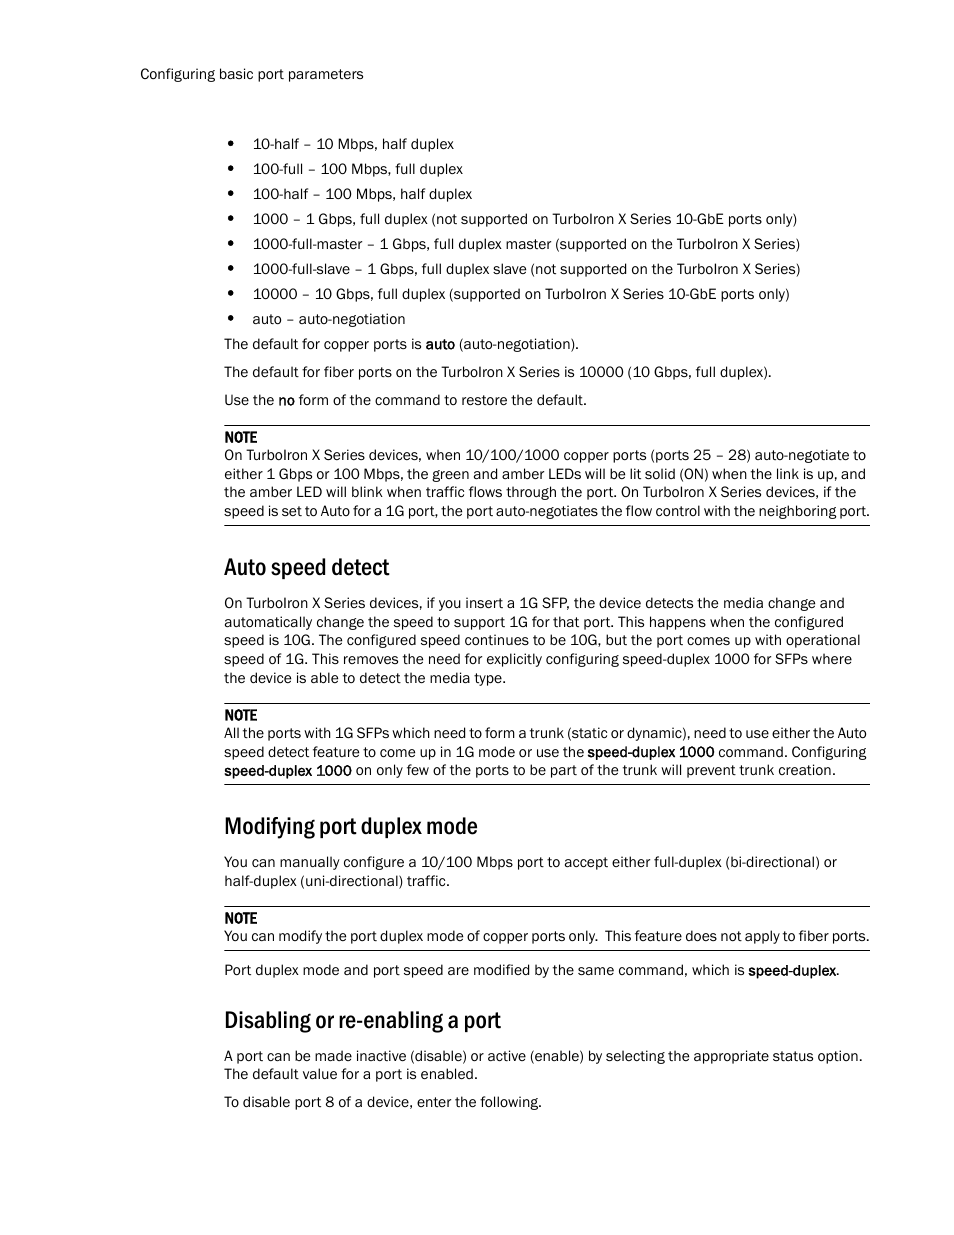 Auto speed detect, Modifying port duplex mode, Disabling or